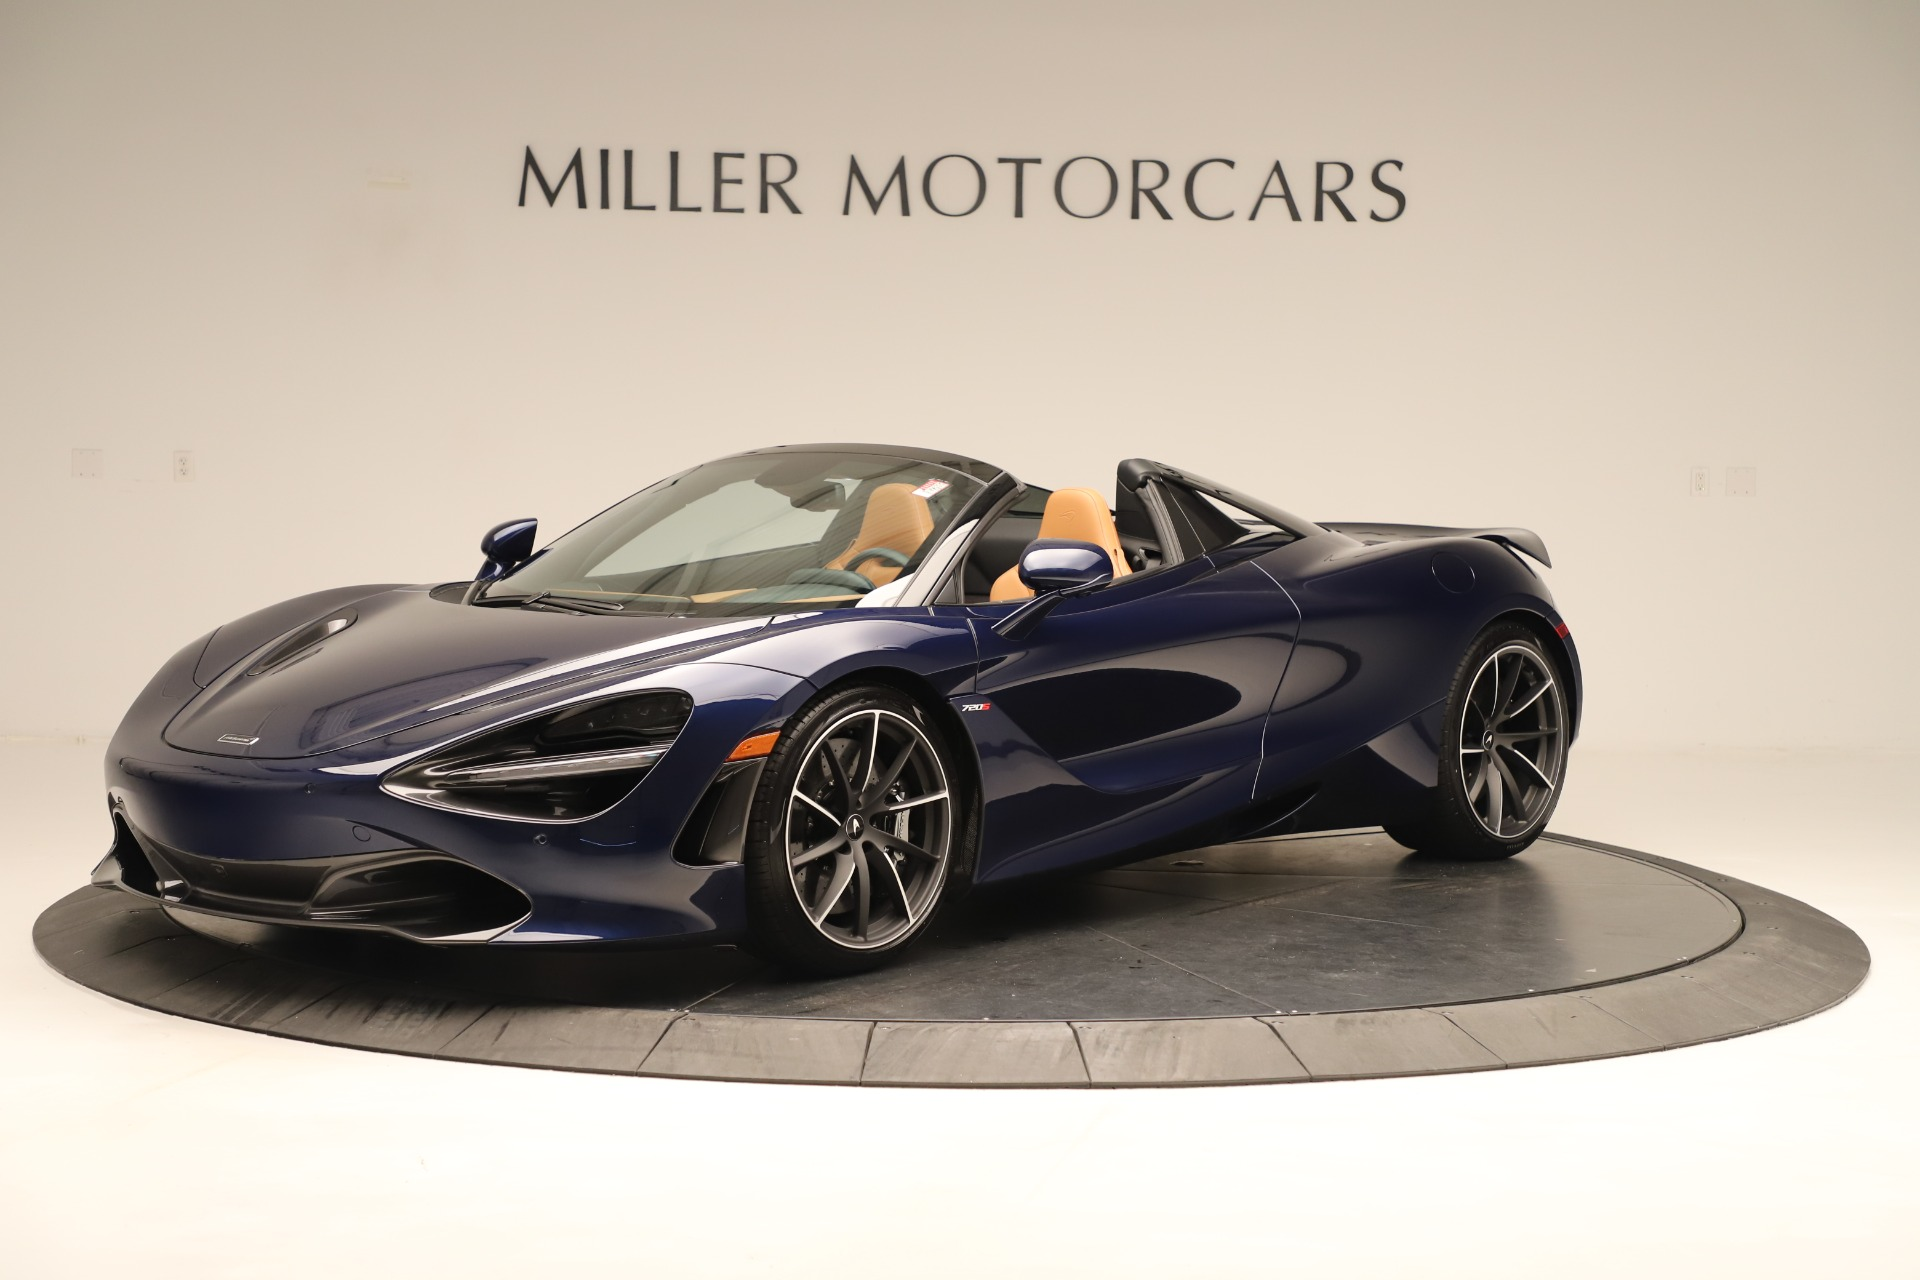 Used 2020 McLaren 720S Spider for sale $334,900 at McLaren Greenwich in Greenwich CT 06830 1